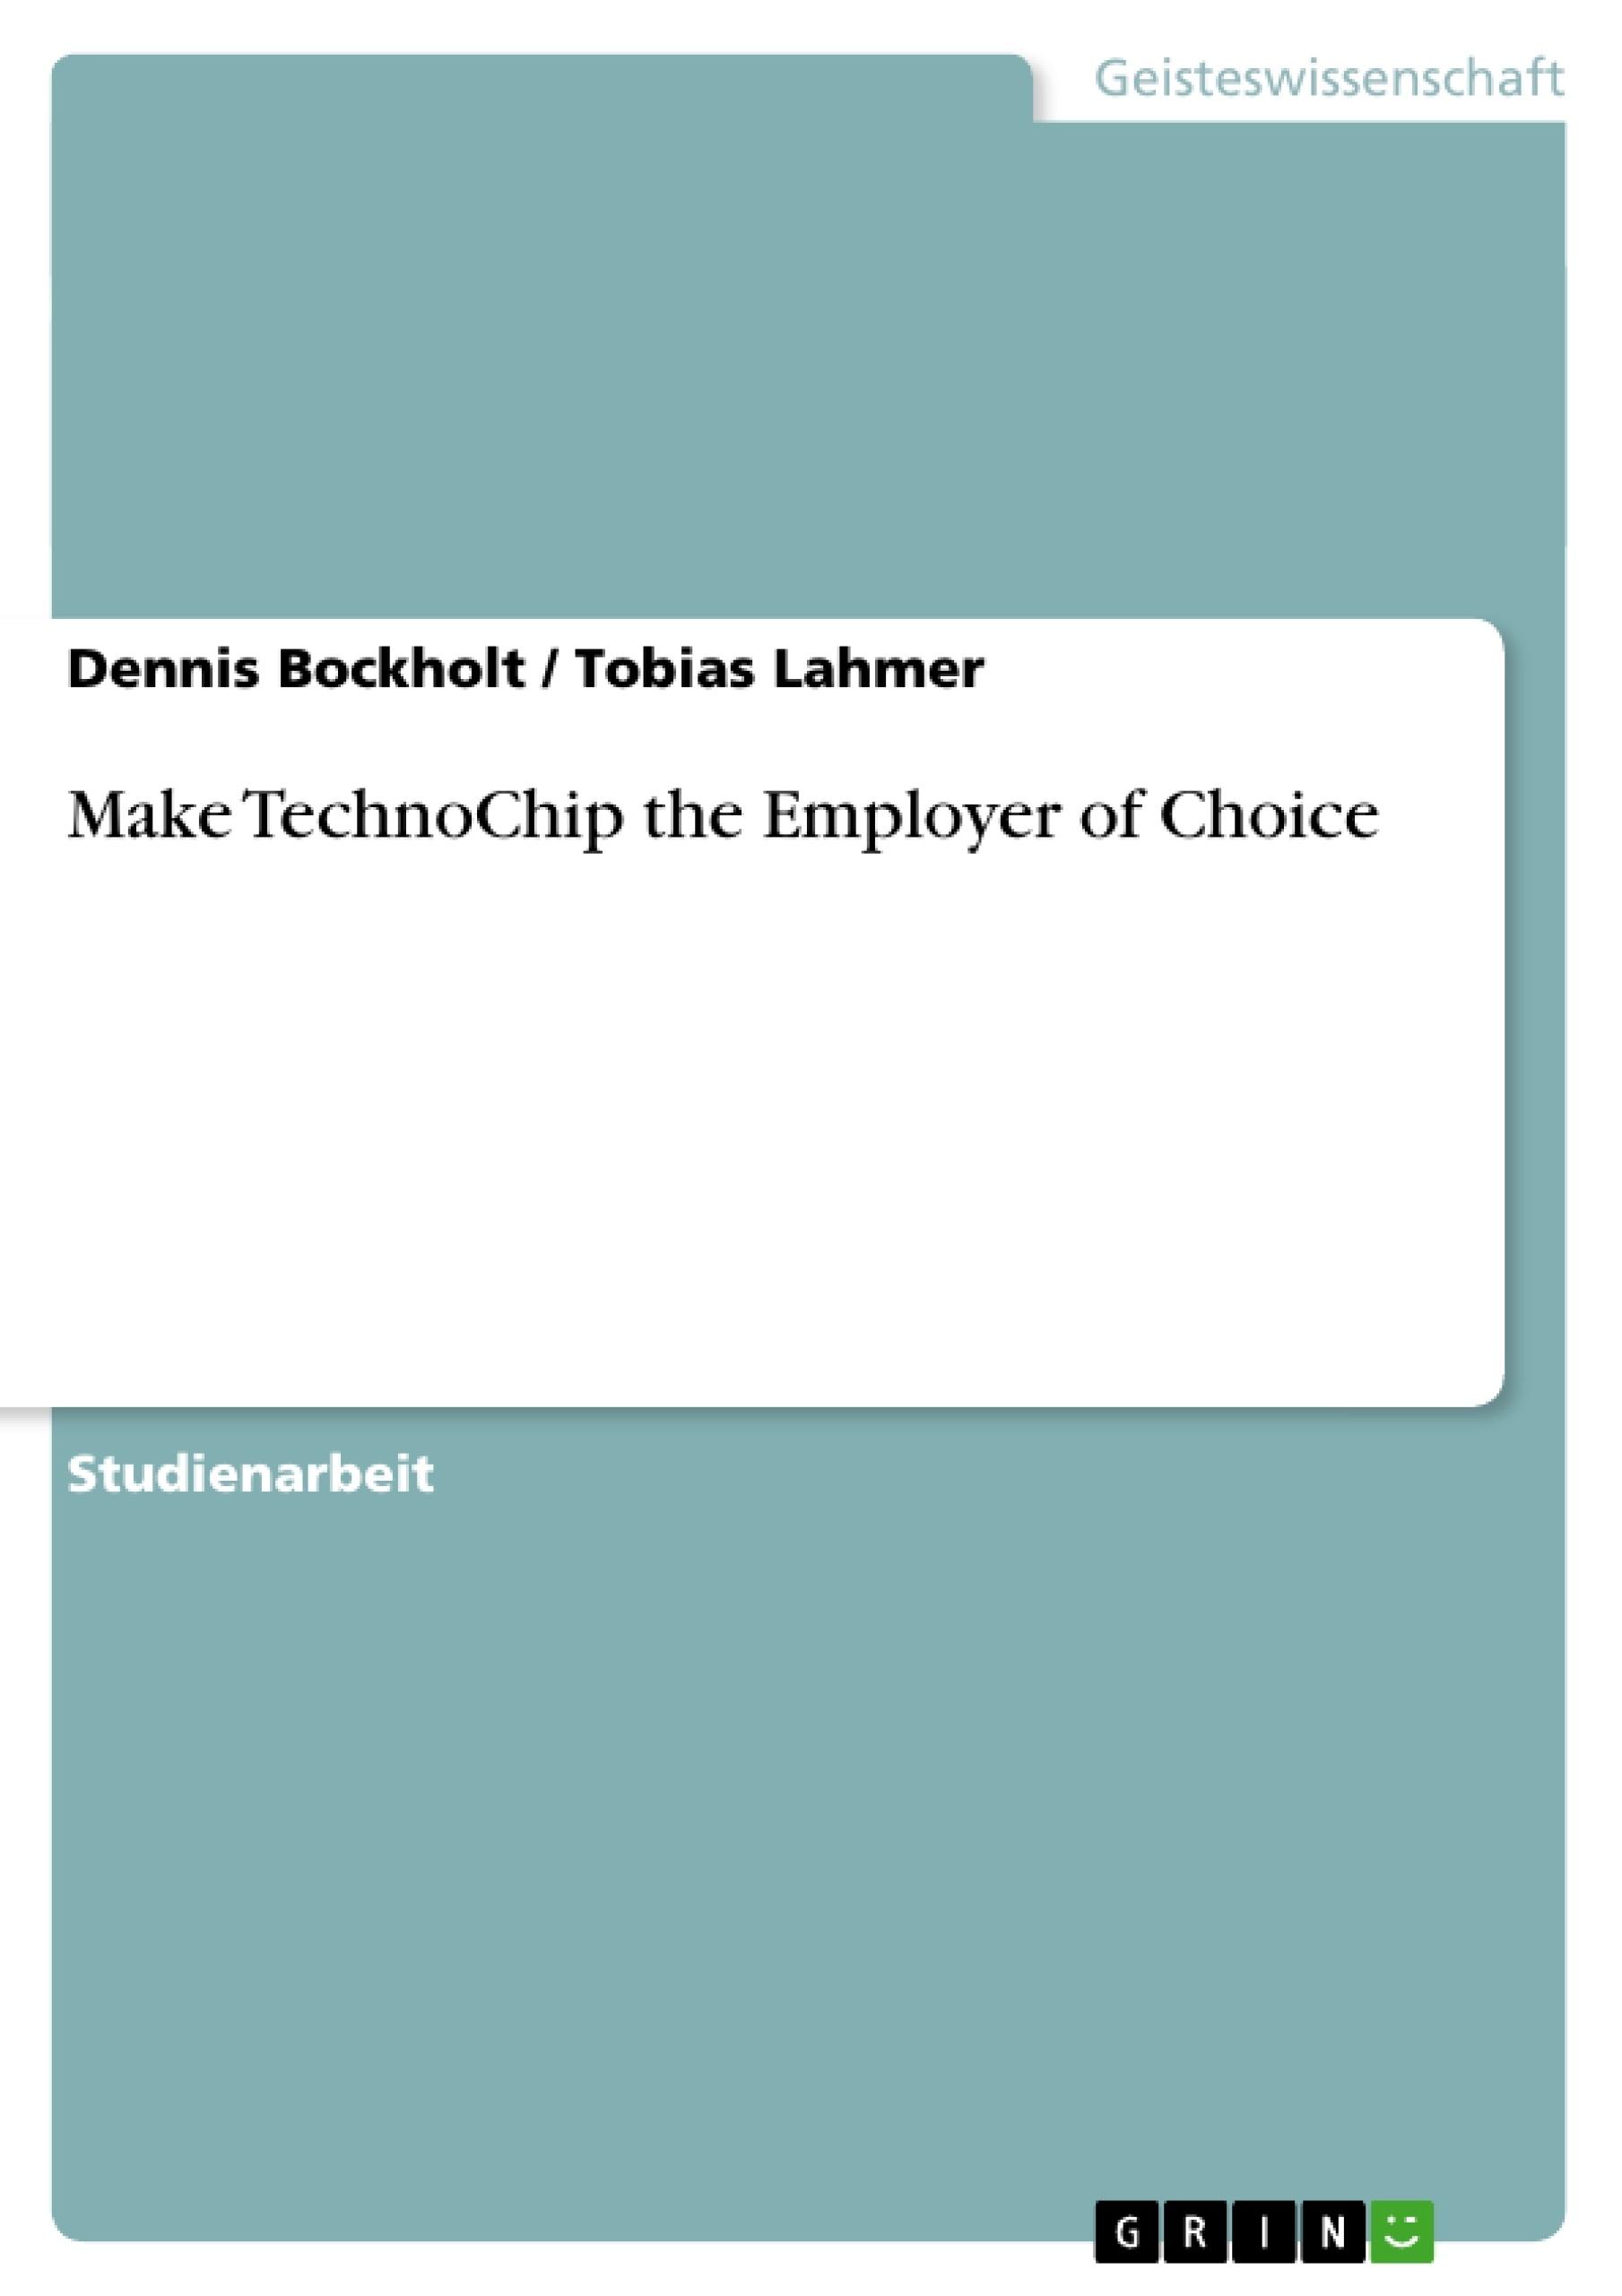 Titel: Make TechnoChip the Employer of  Choice